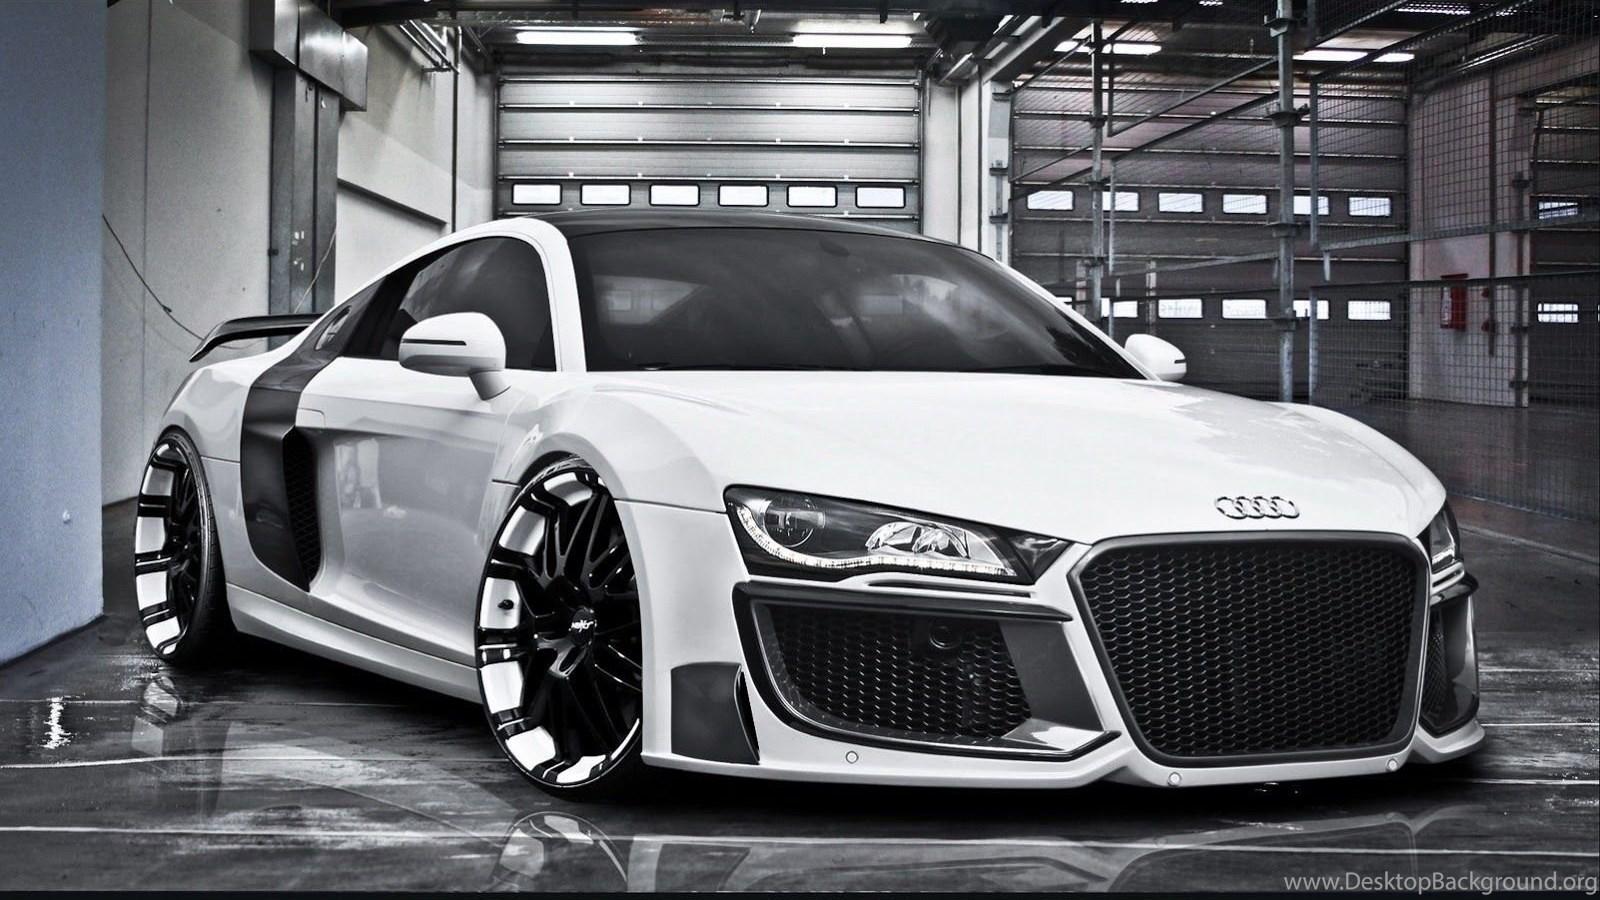 hd car wallpapers, high resolution cars, wheels, powerful cars